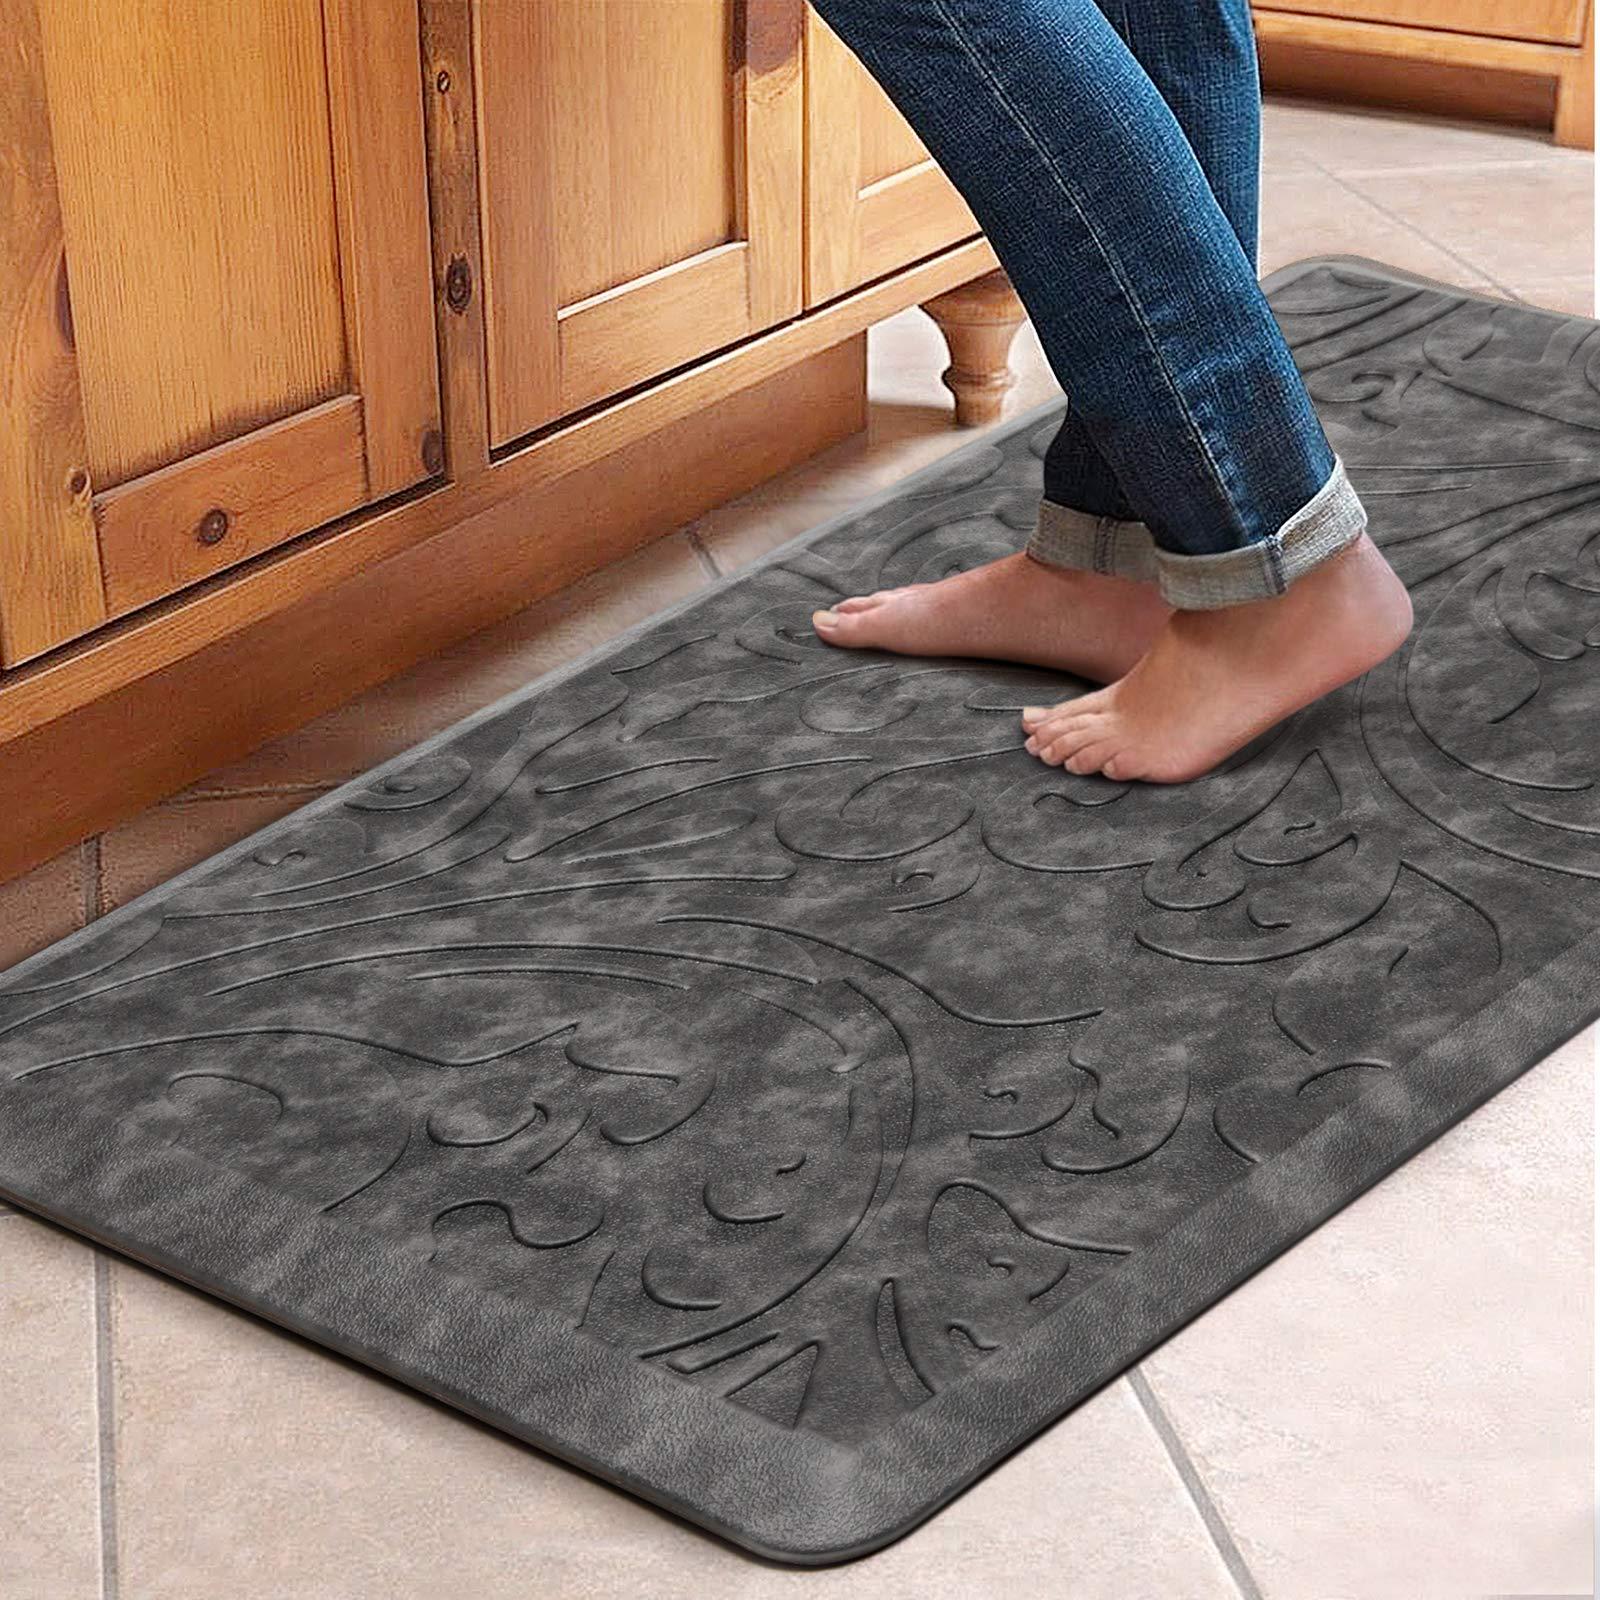 "KMAT Kitchen Mat Cushioned Anti-Fatigue Floor Mat Waterproof Non-Slip Standing Mat Ergonomic Comfort Floor Mat Rug for Home,Office,Sink,Laundry,Desk 20""(W) x 39""(L),Grey"